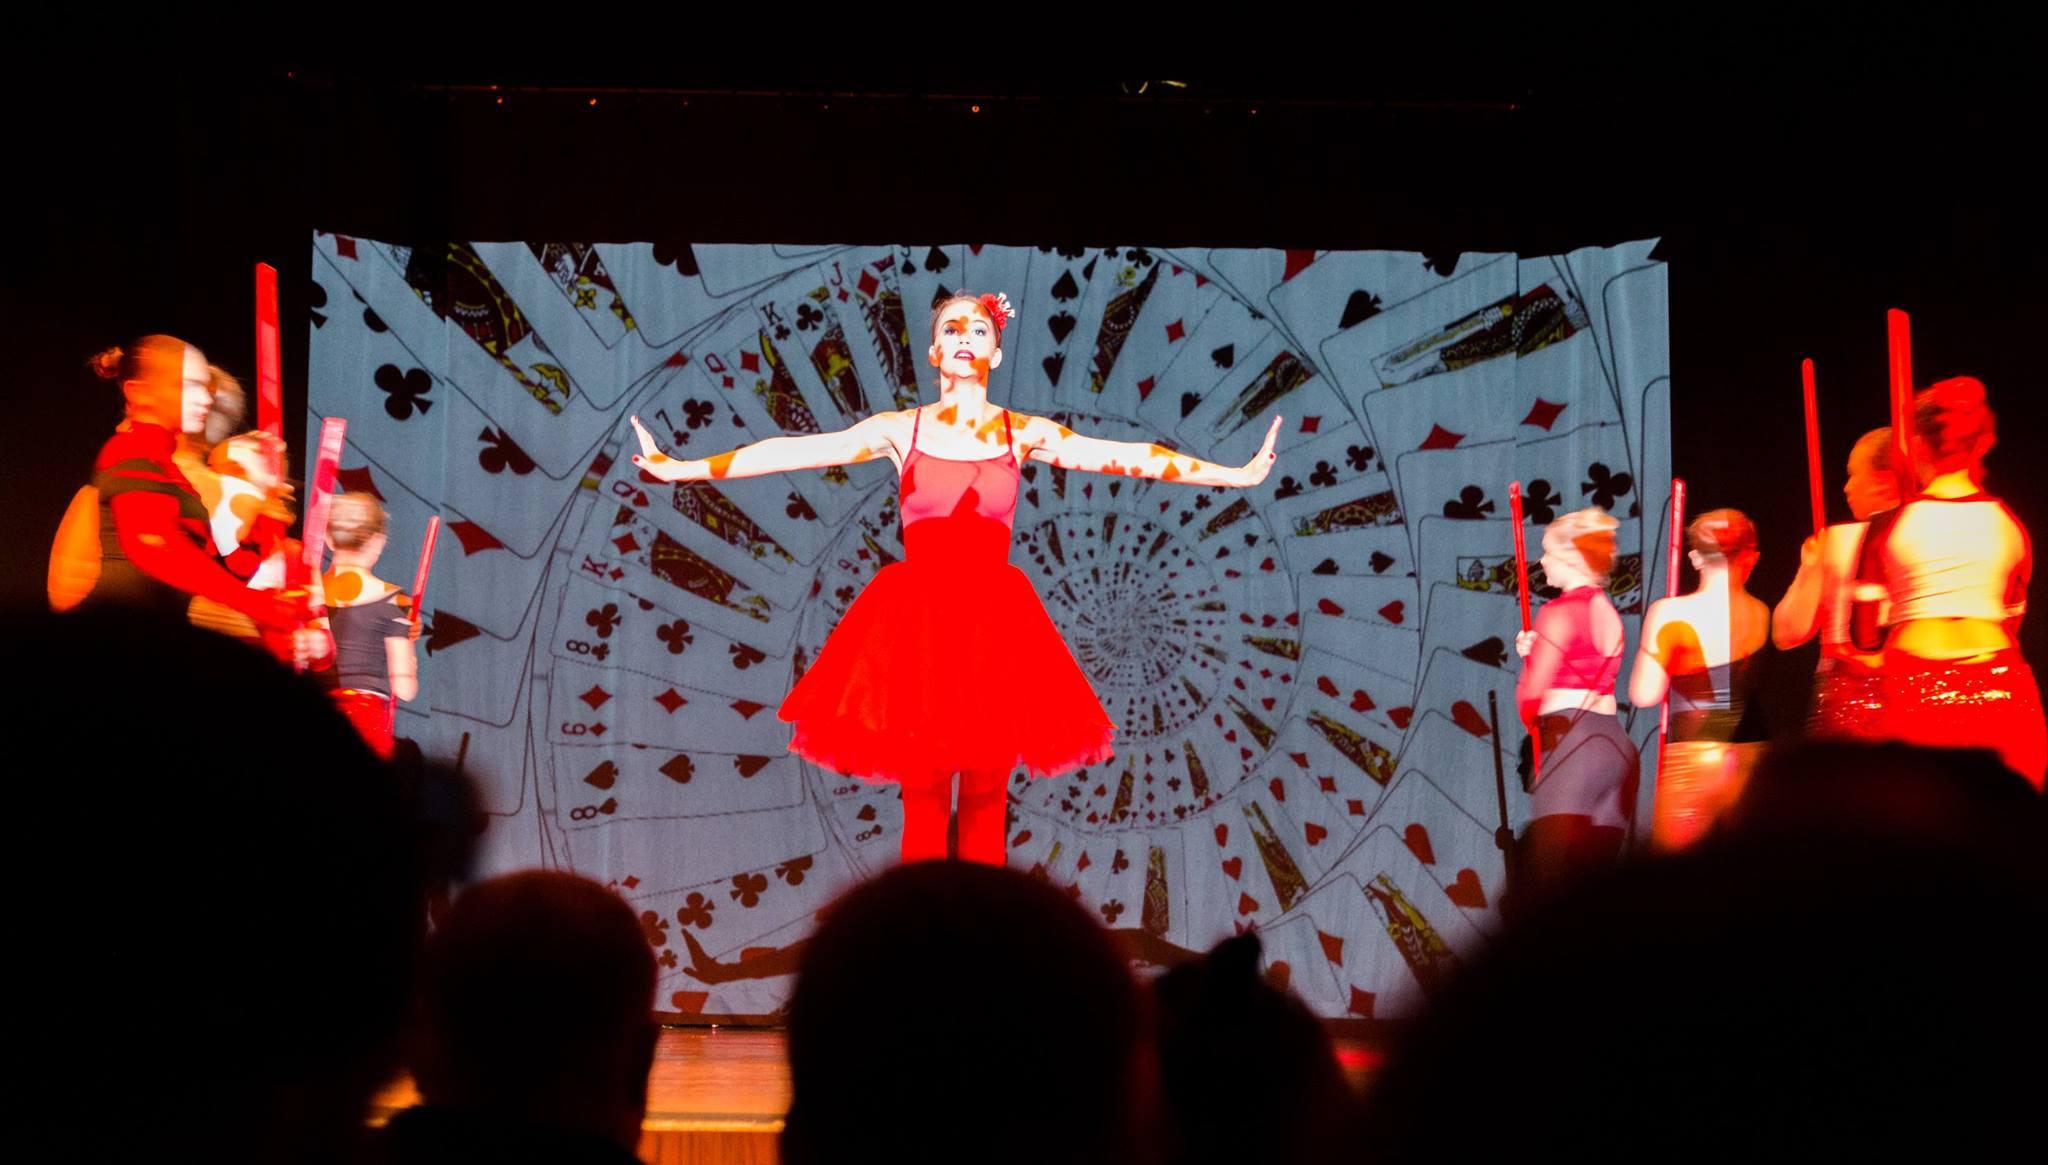 grace-dance-studio-kaiserslautern-einsiedlerhof-gallery-spring-showcase-alice-in-wonderland-5